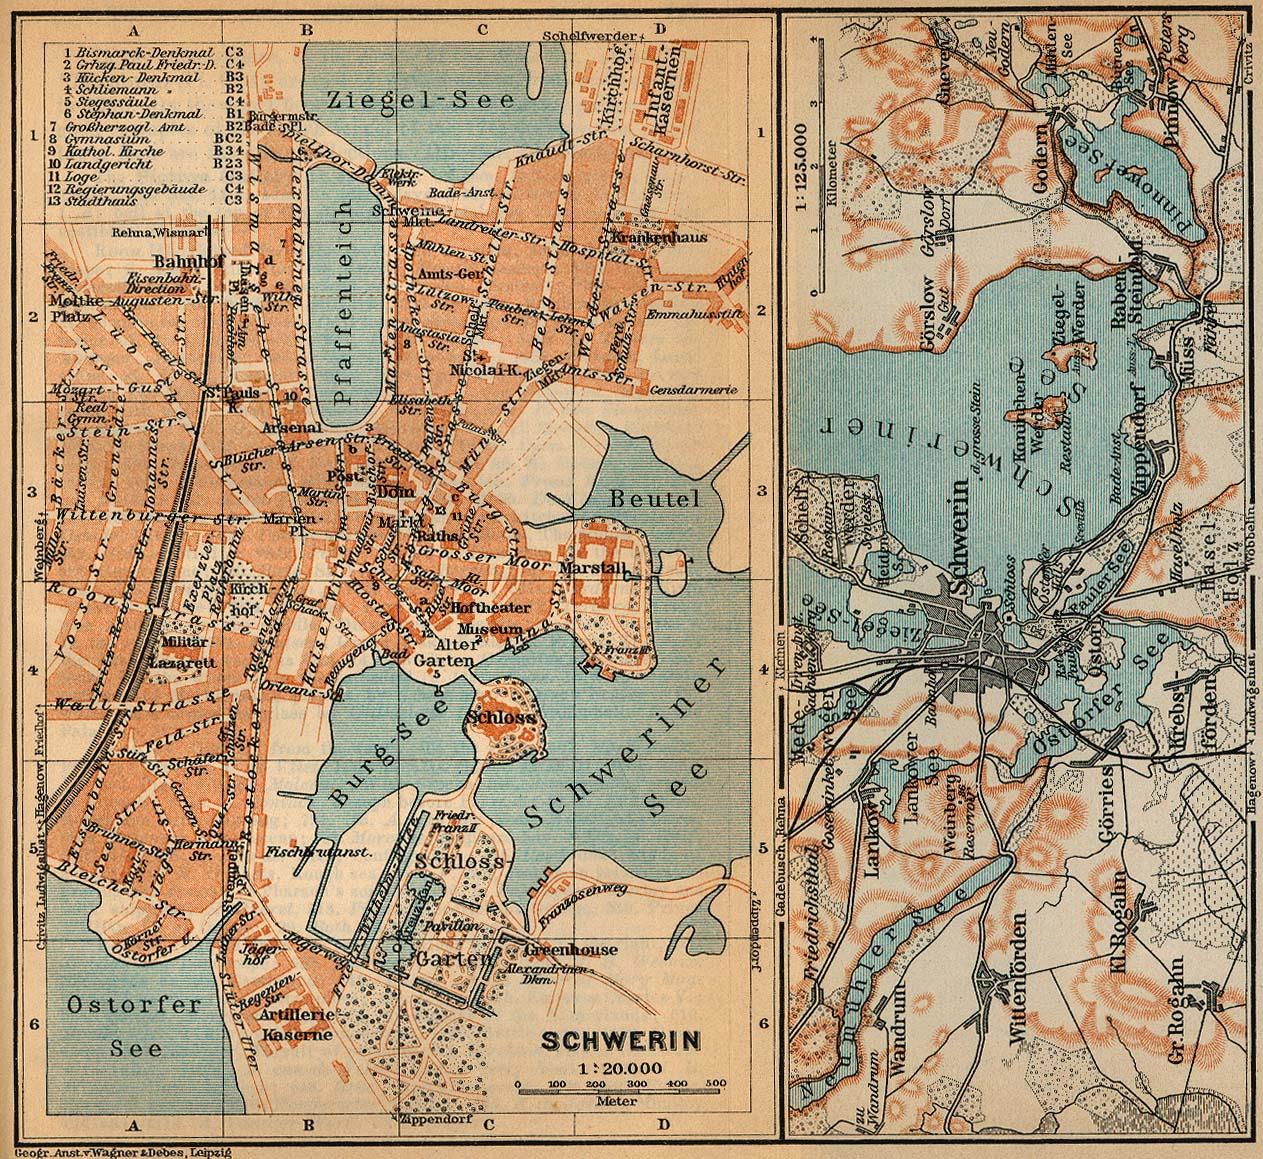 Environs of Schwerin Map, Germany 1910